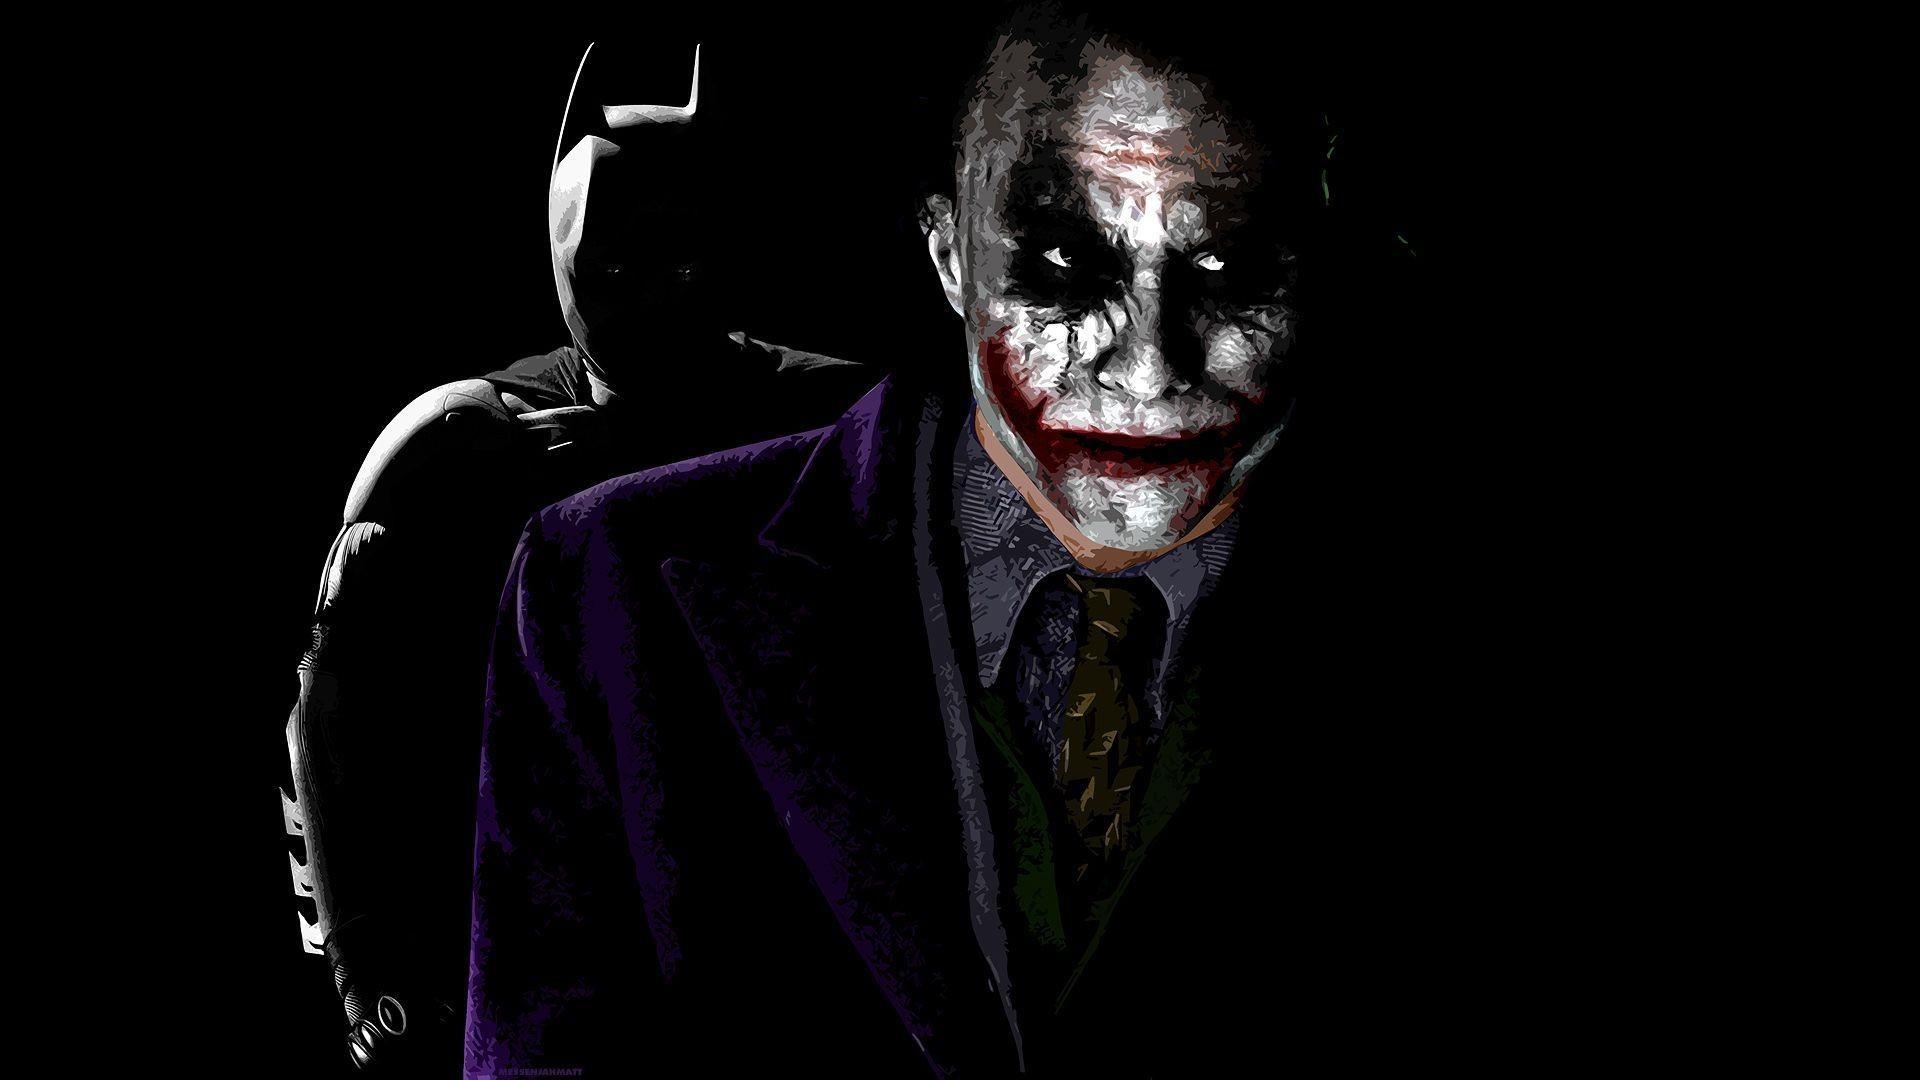 batman vs joker essay Free essays on joker essay get help with your writing 1 through 30.